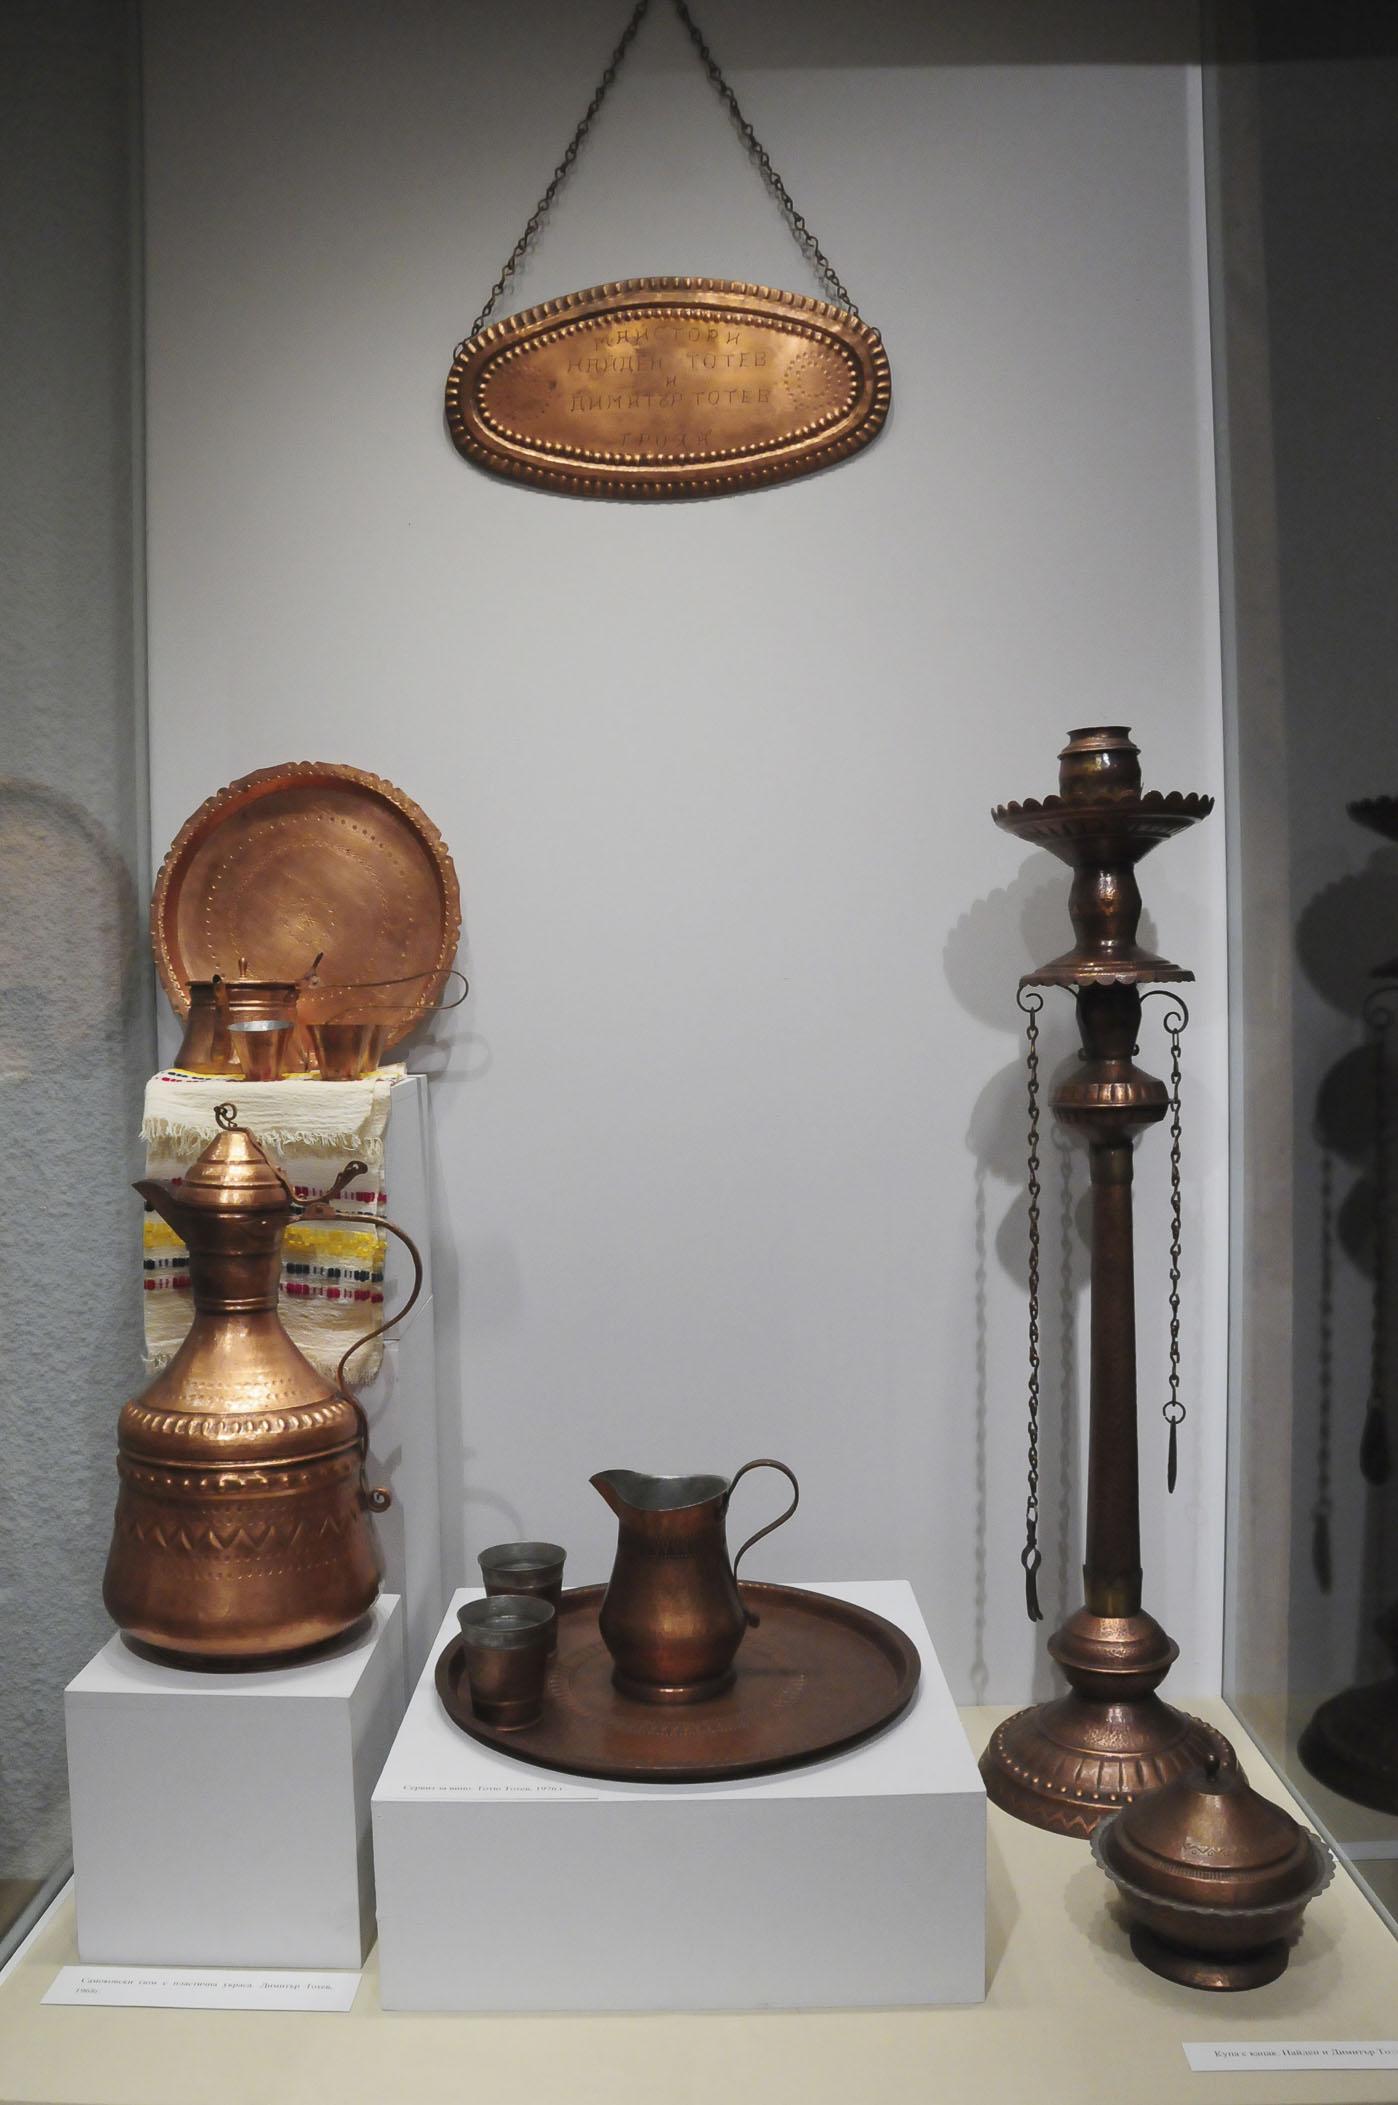 troyan-museum-mednikarstvo-ot-troyanskiq-krai-22